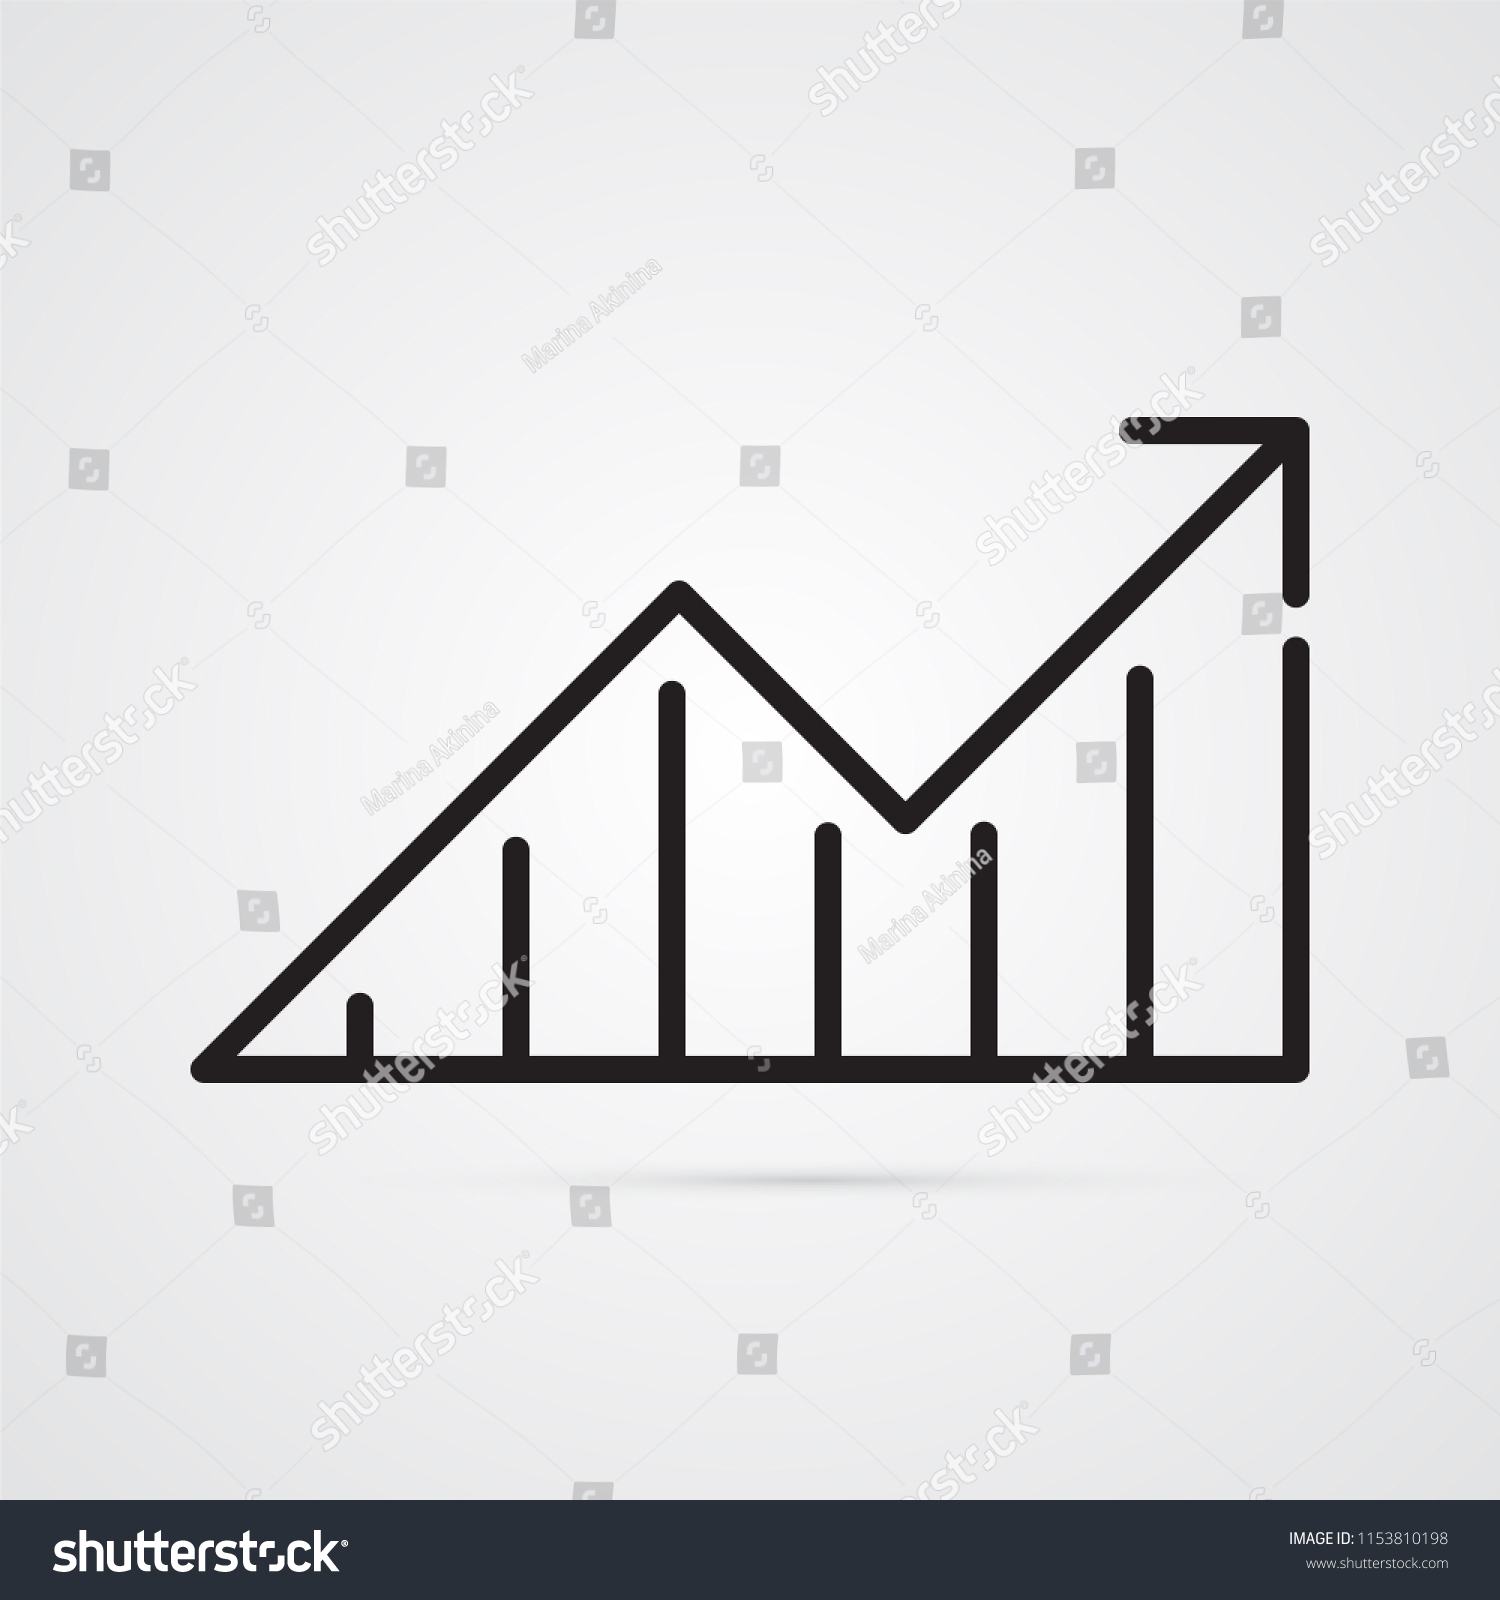 Arrow Blocks Illustration Phased Progress Increase Stock Vector